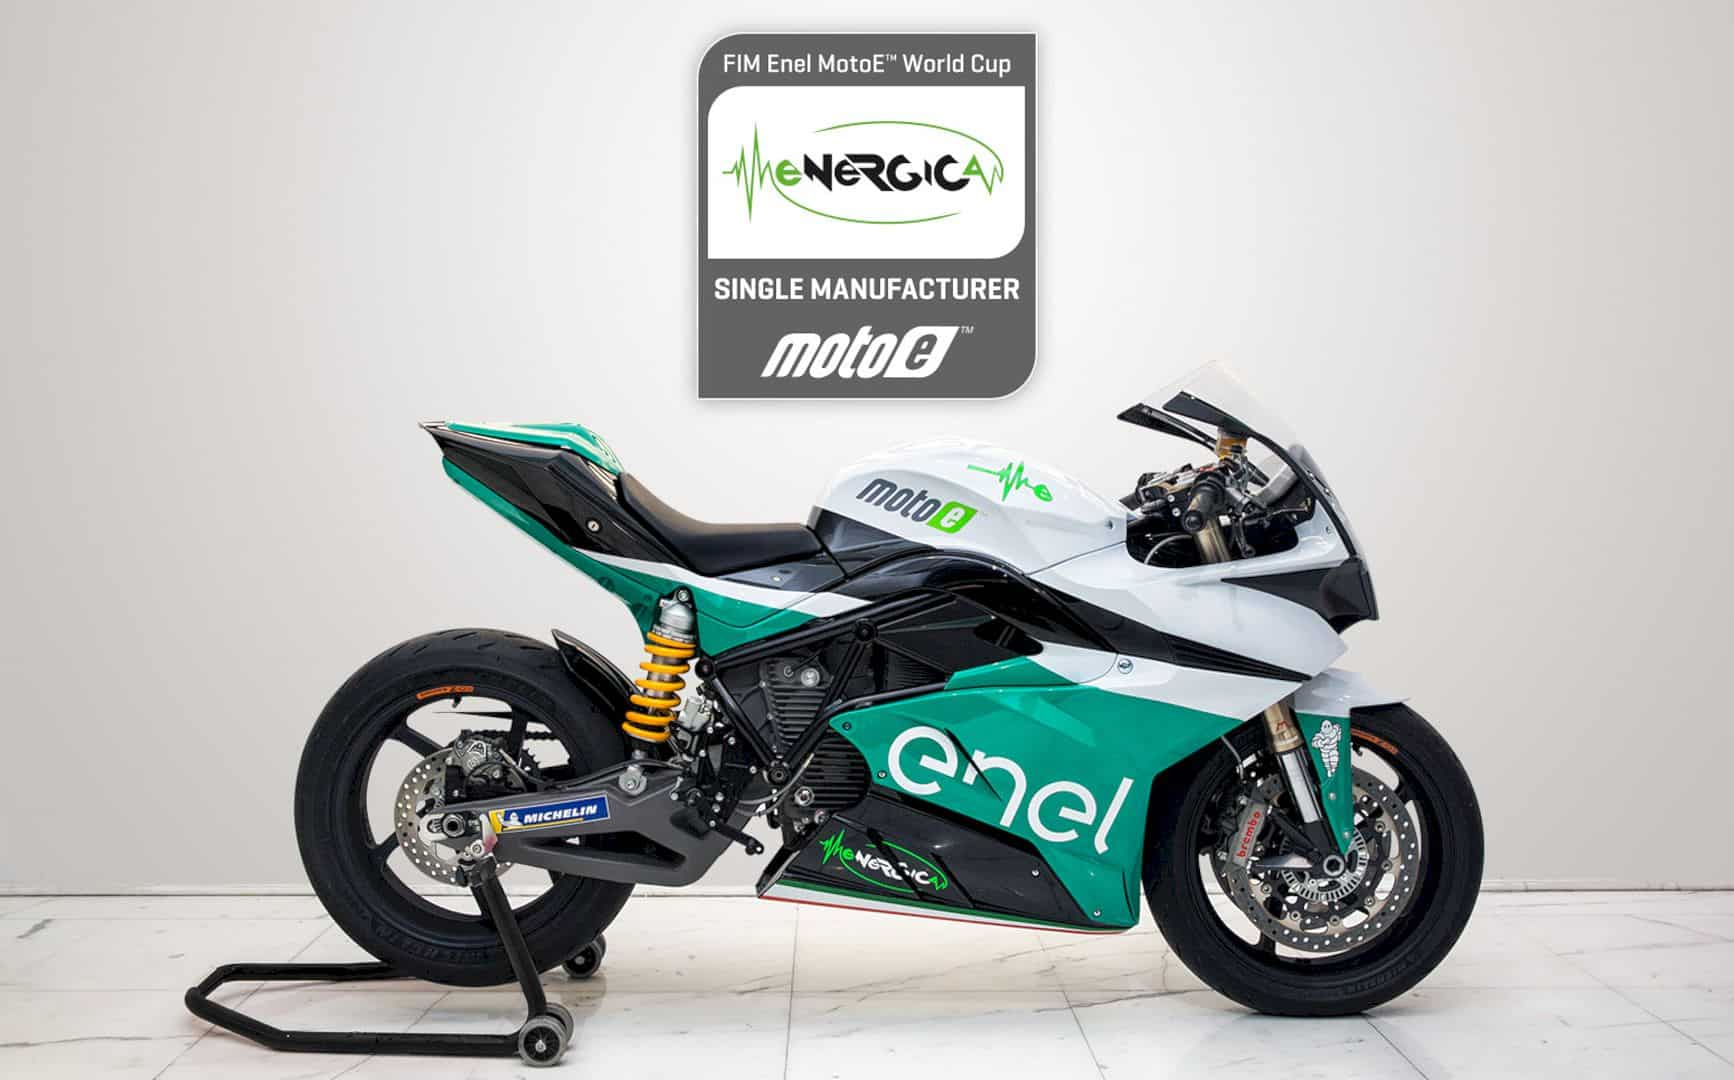 Energica Motor Company Dubai UAE